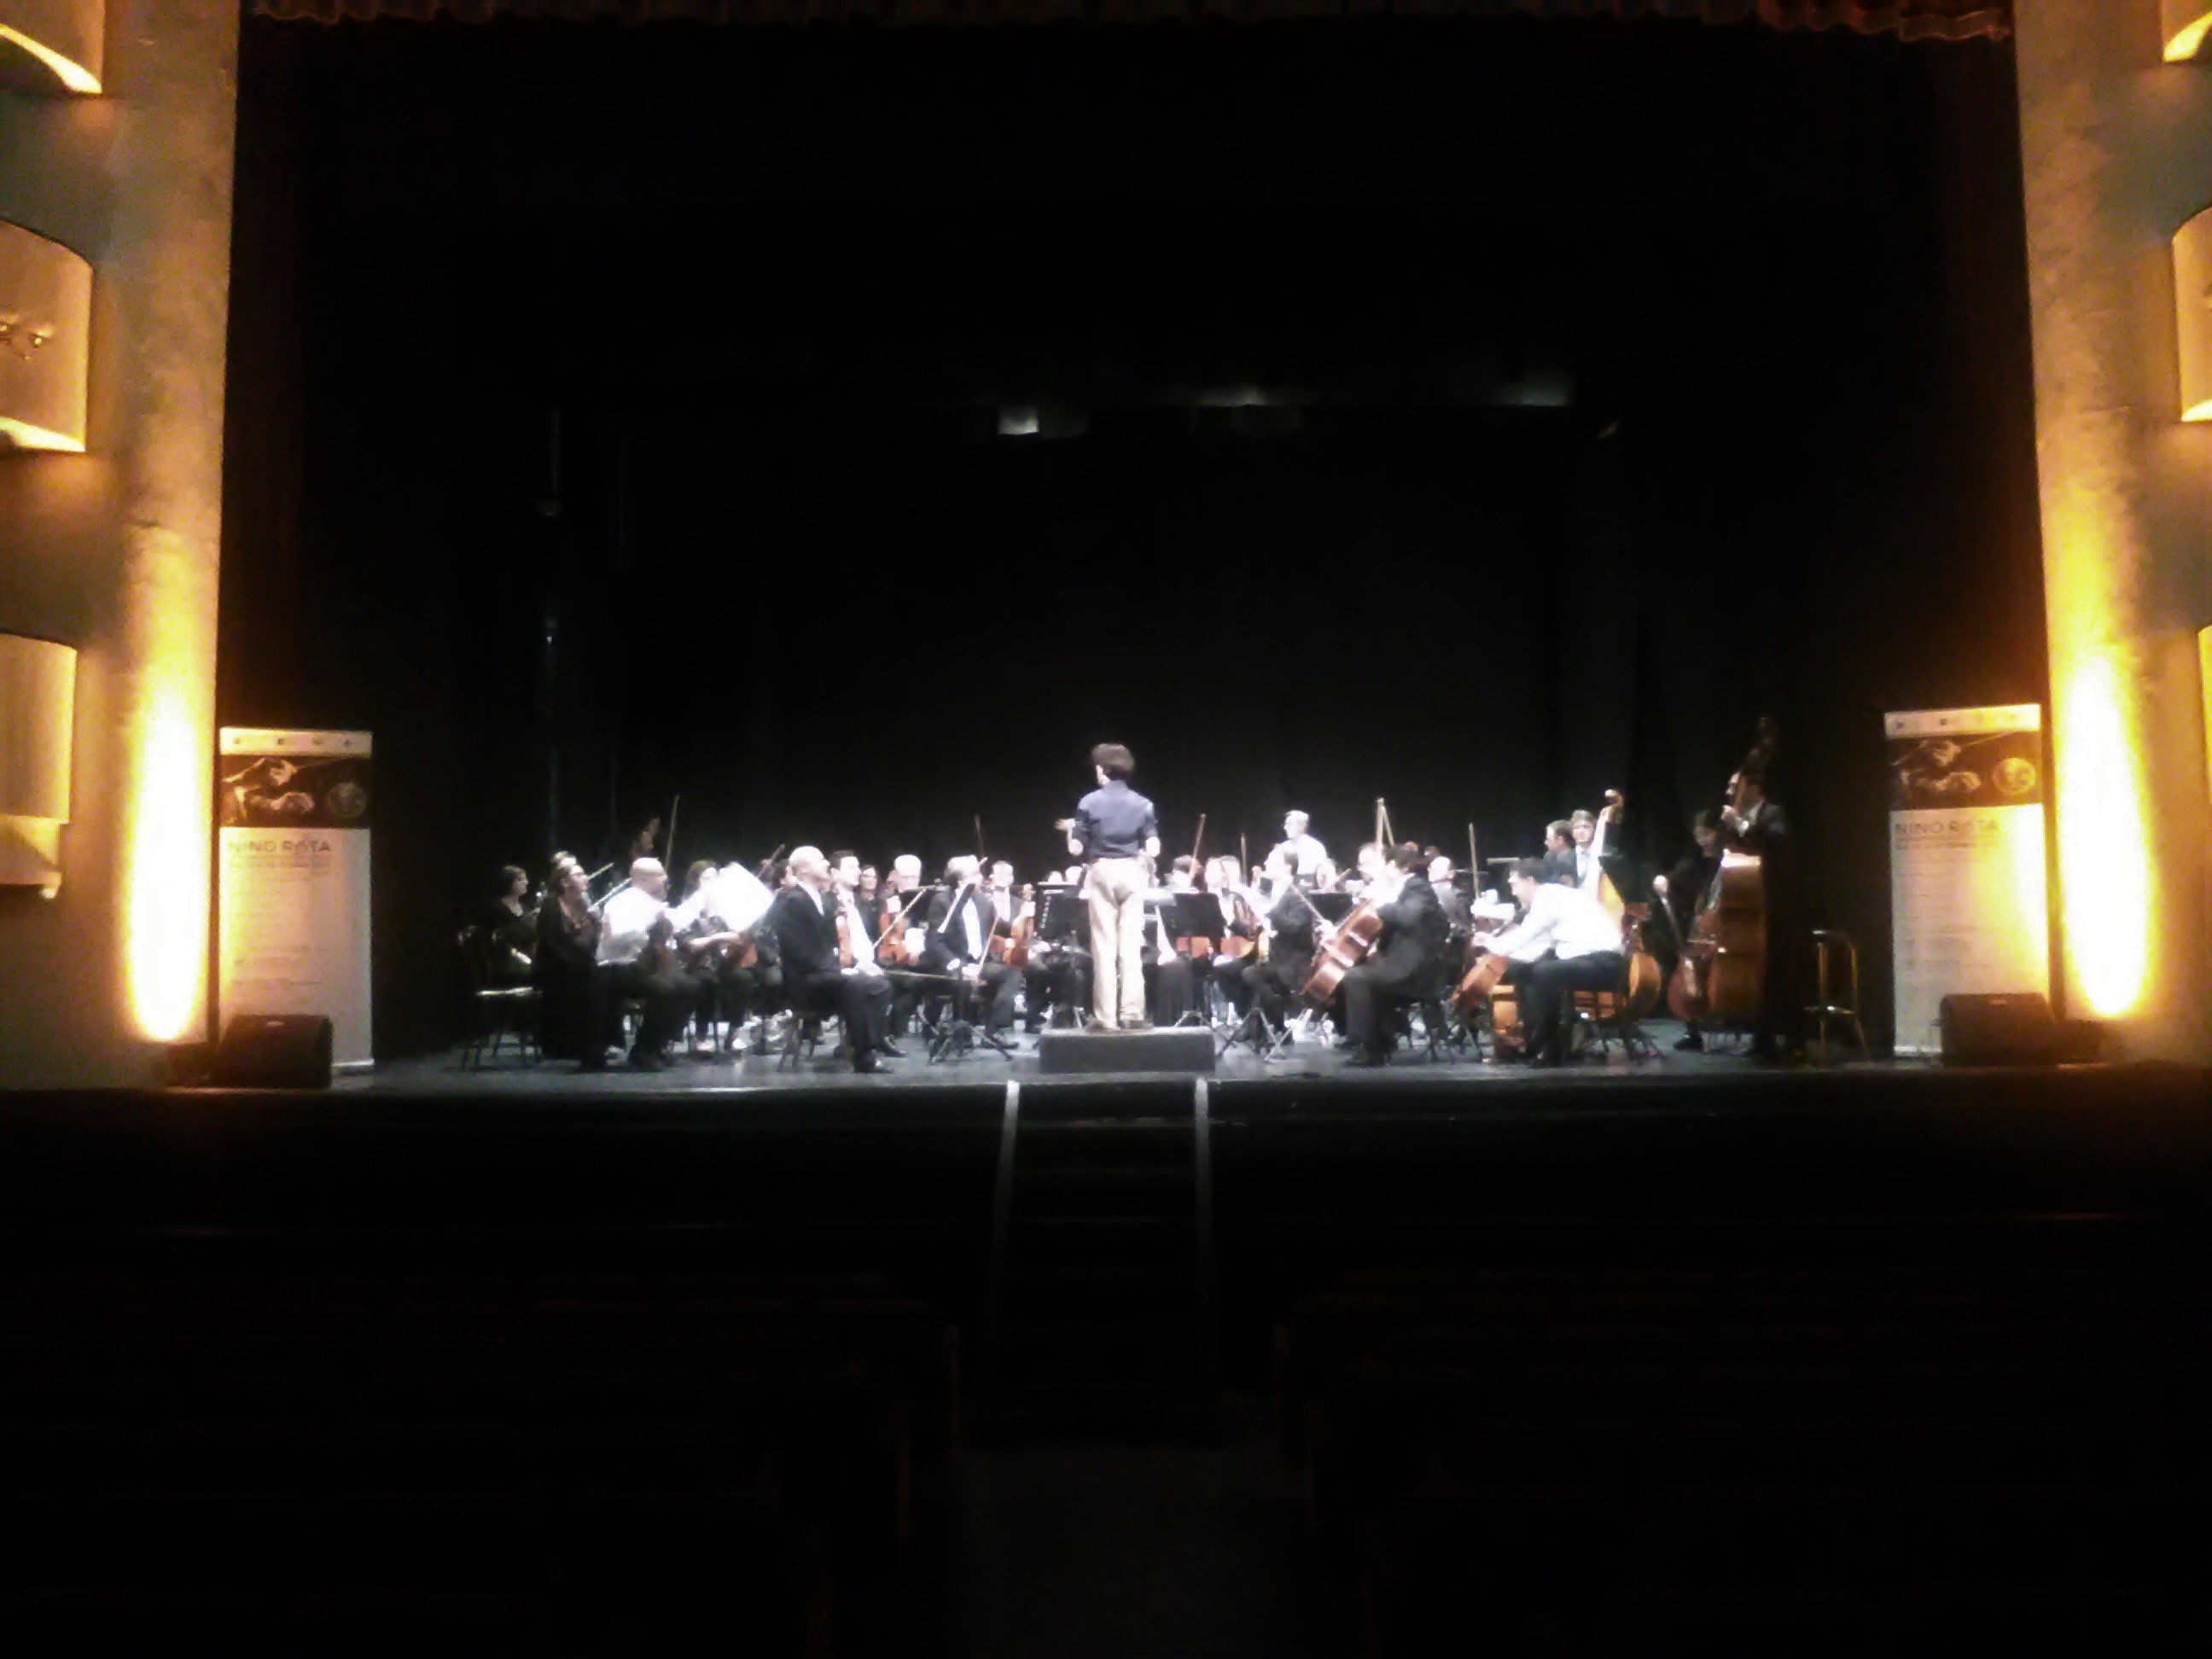 Teatro Orfeo di Tarento (Italy)